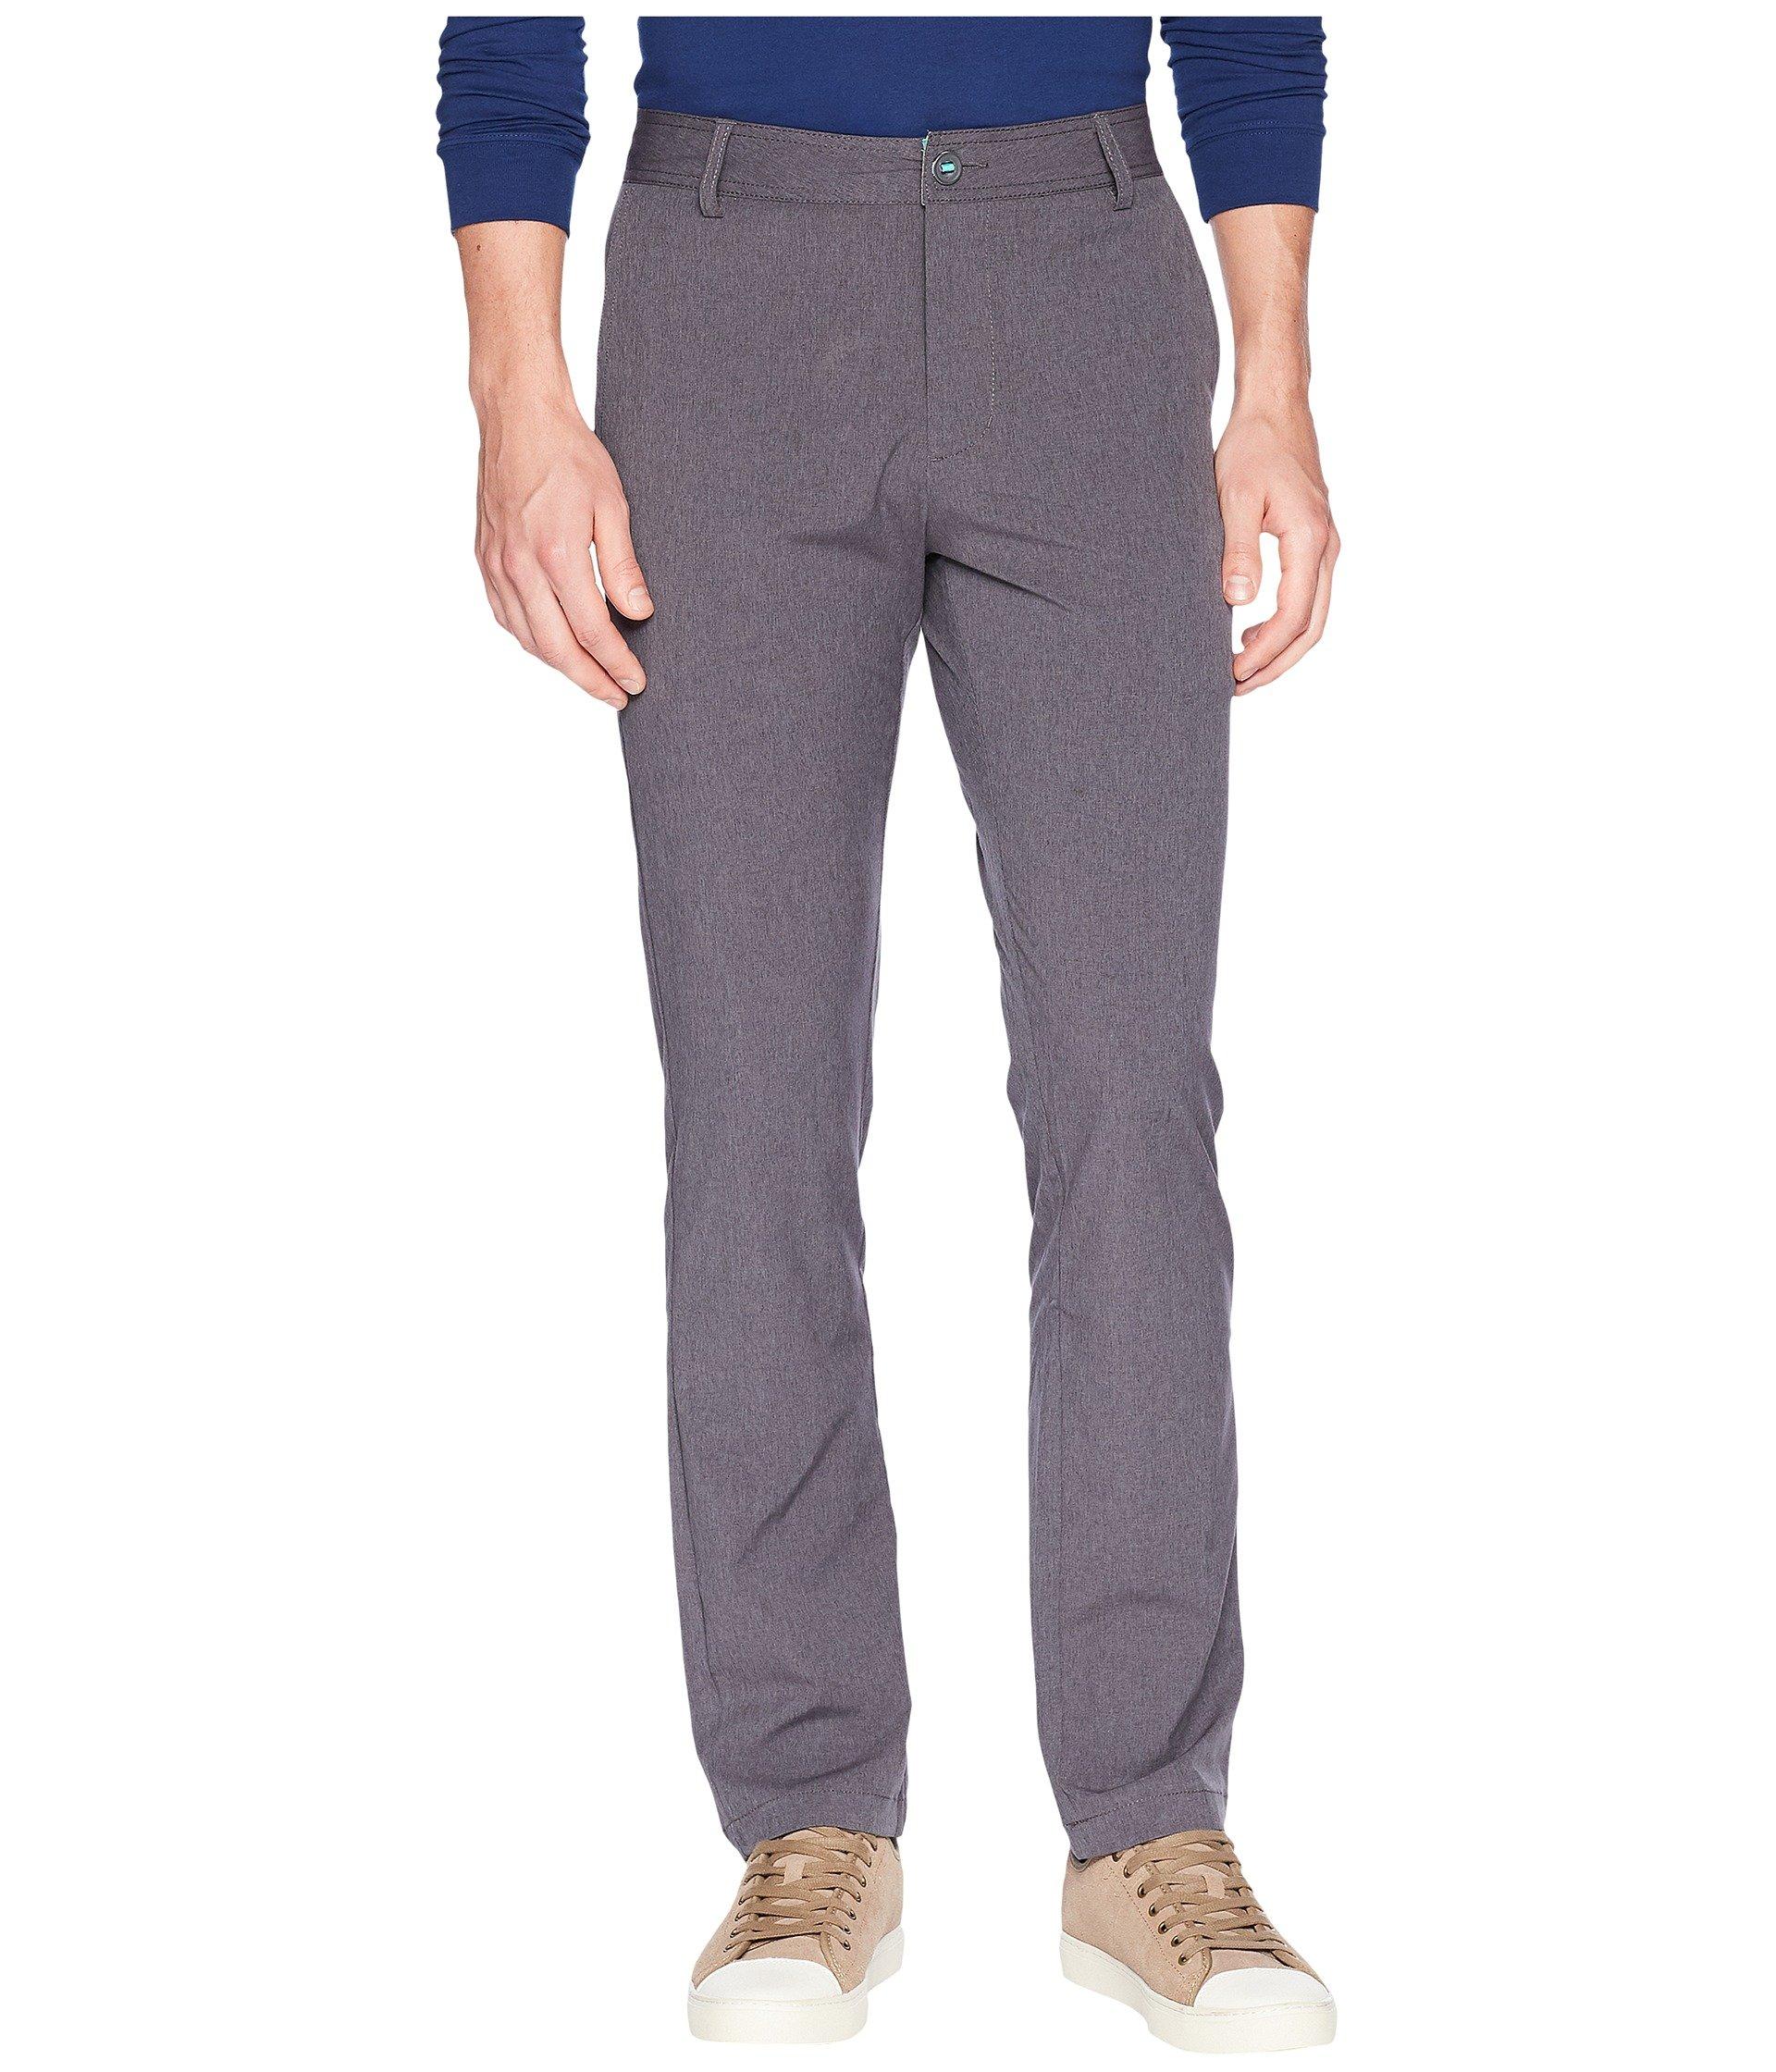 Linksoul Boardwalker Ls662 Black Ls662 Linksoul Pants q7zrxtq4w